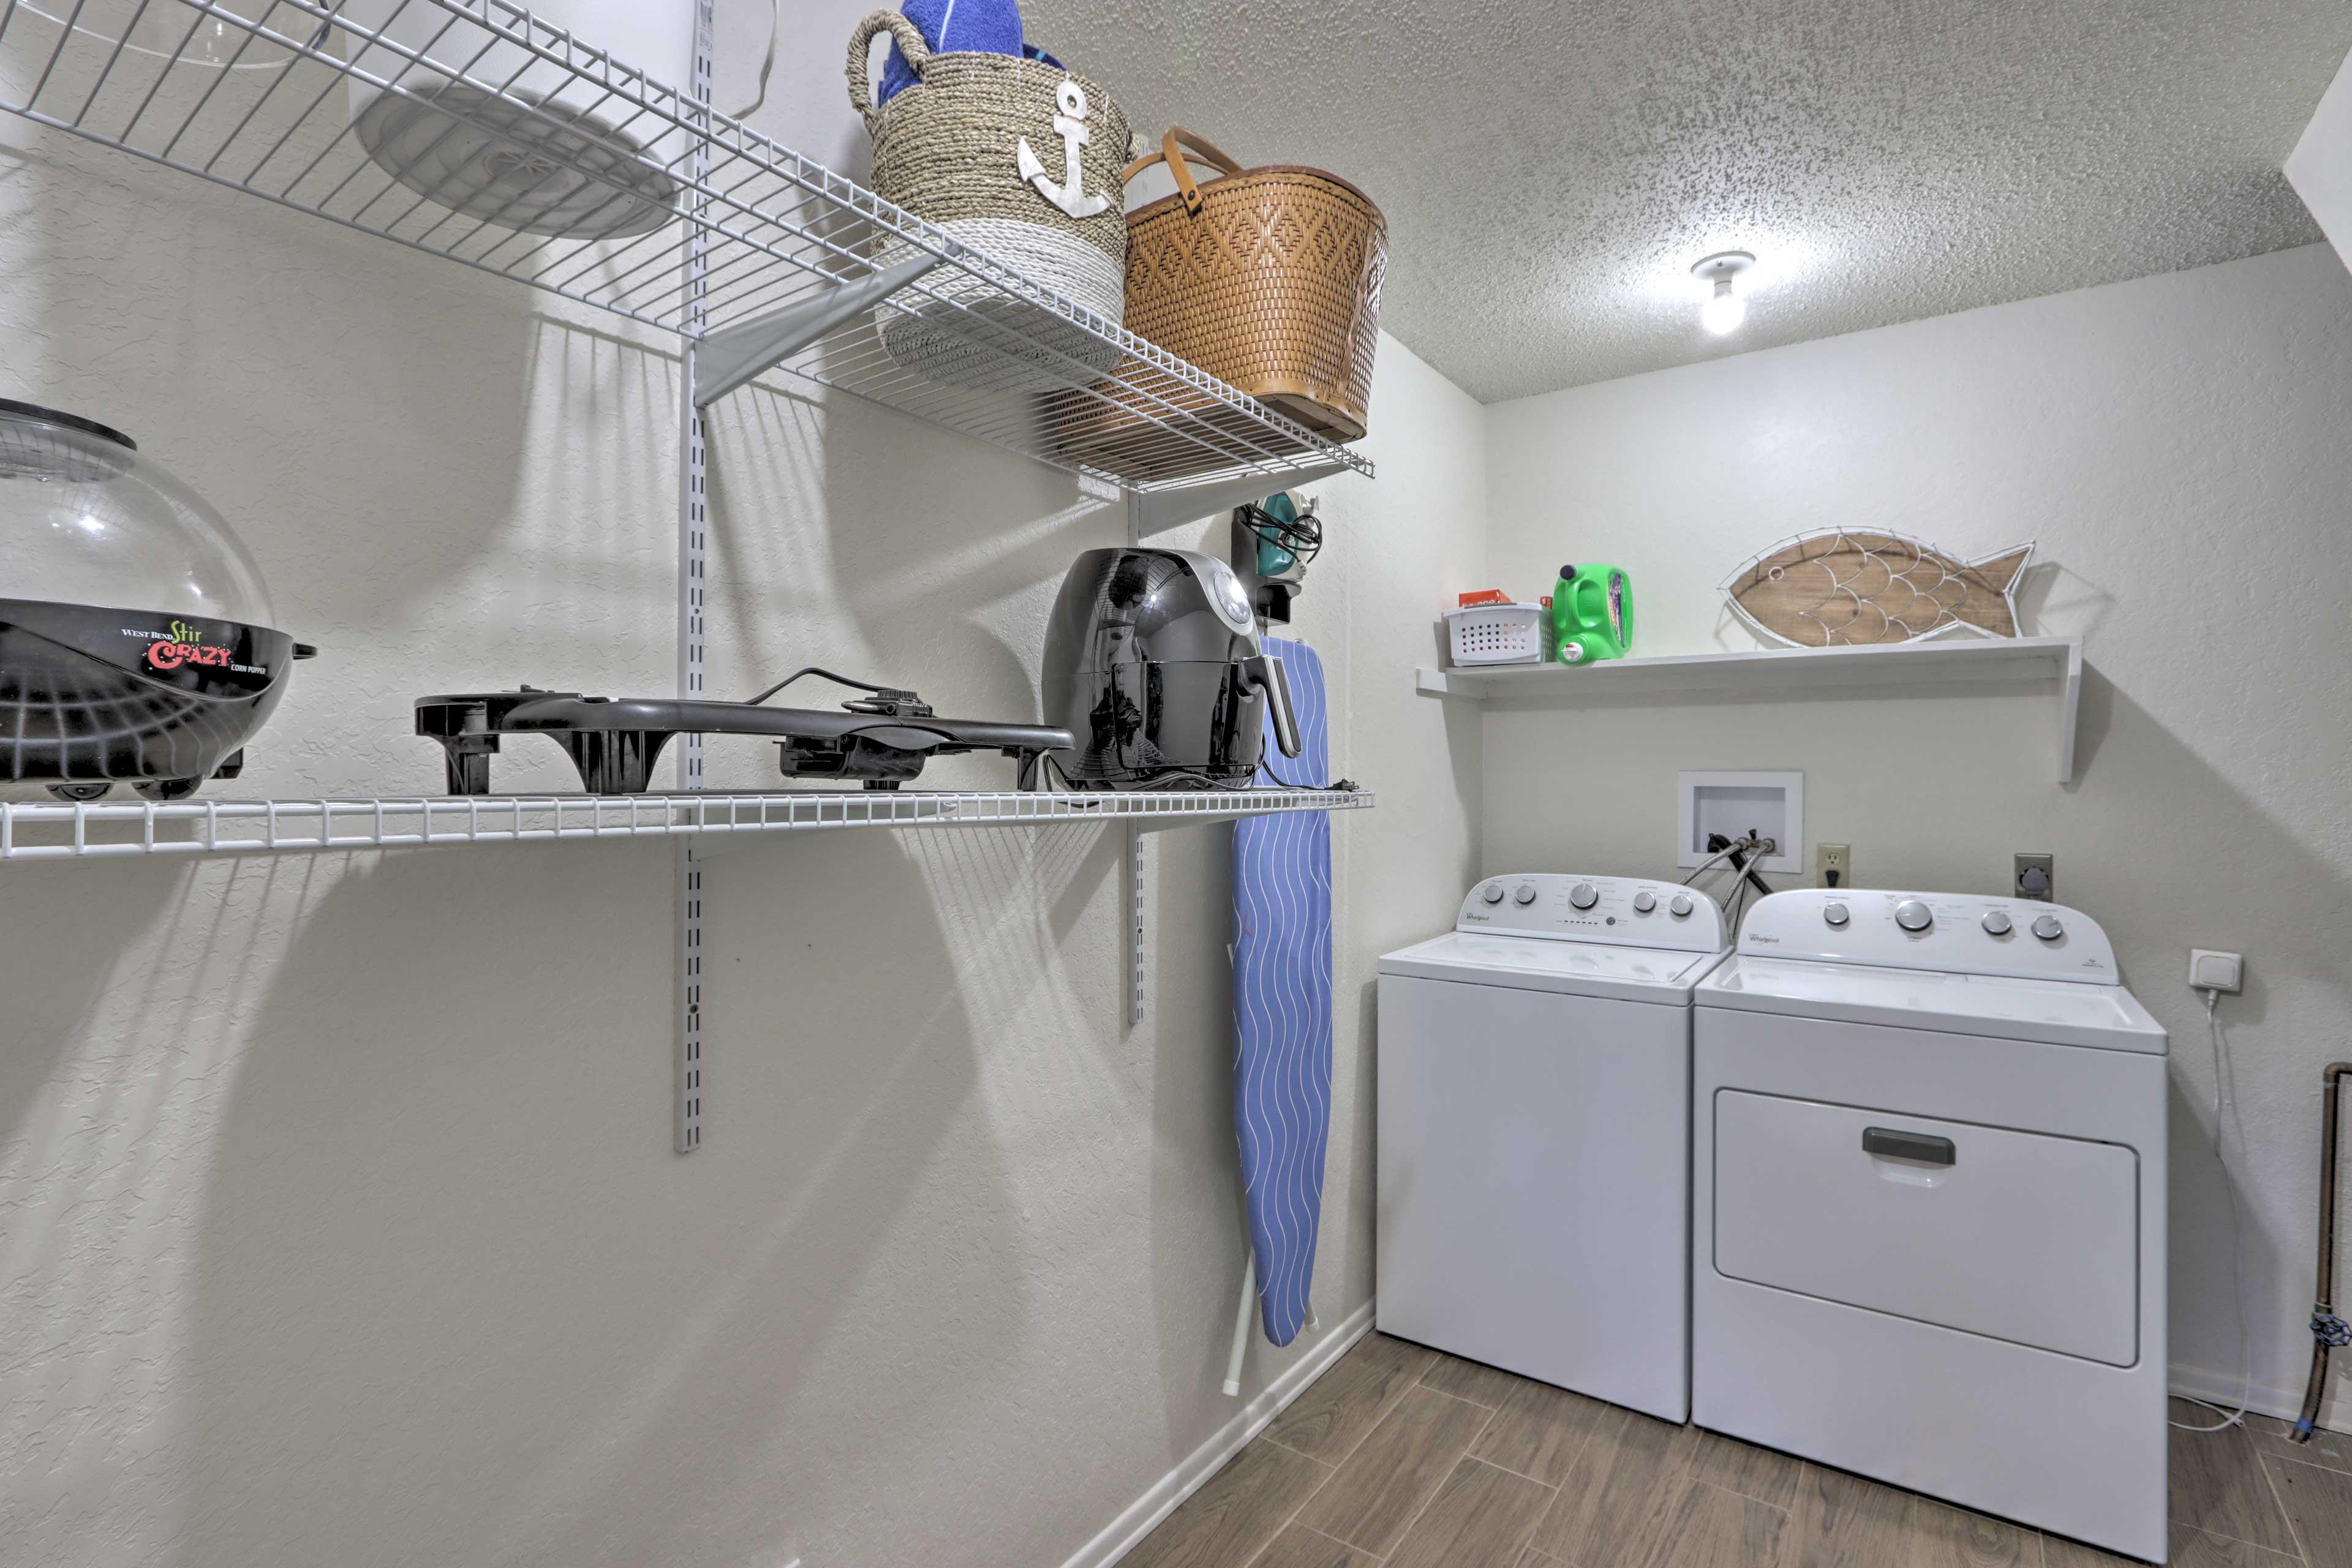 Laundry Room   Ice Cream Maker   Popcorn Maker   Additional Kitchen Appliances